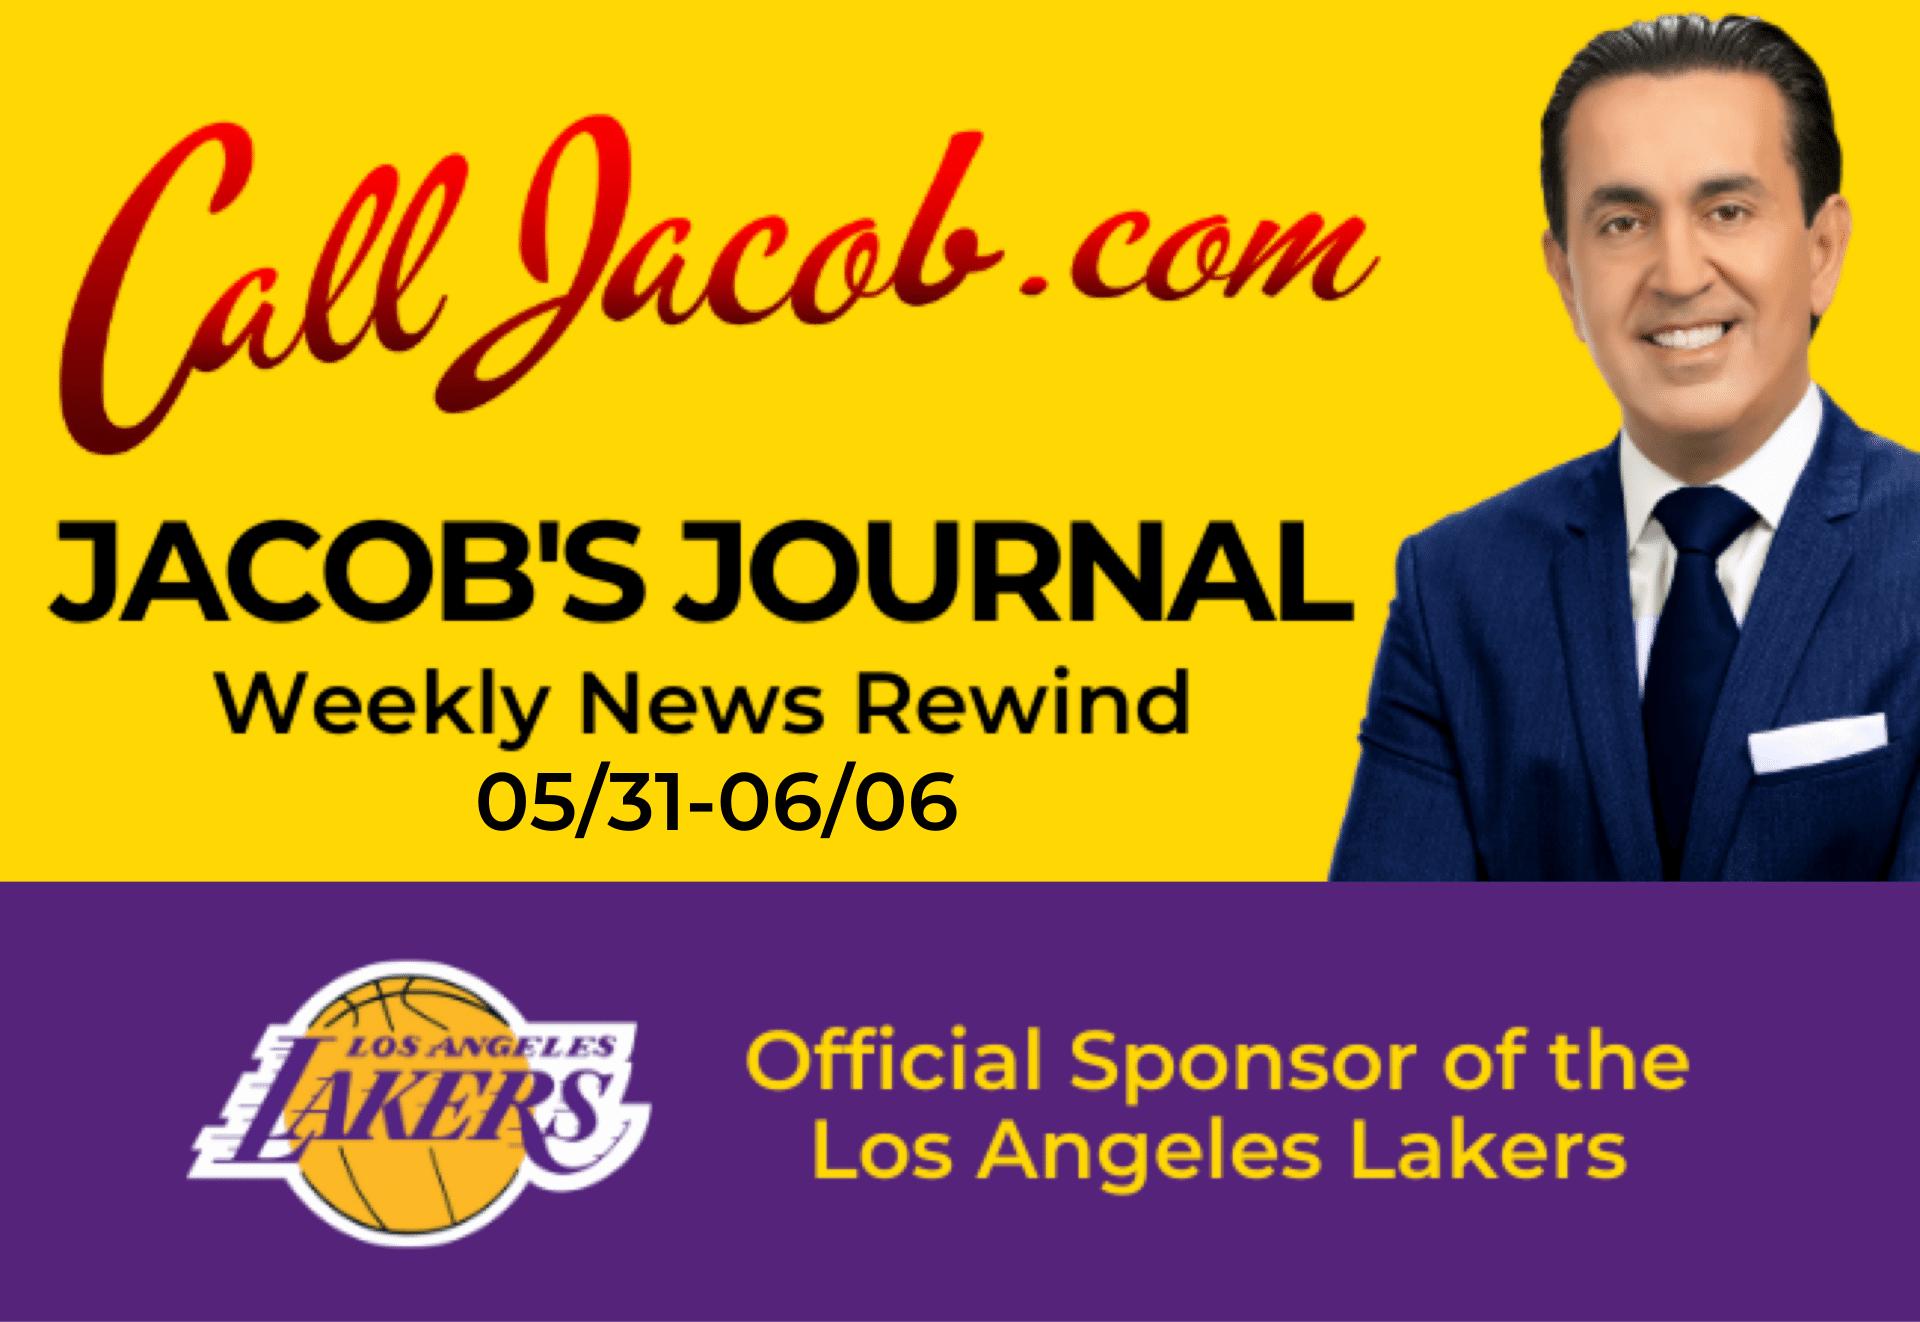 JacobsJournalWeeklyNewsRewind May 31st to June 6th 2021